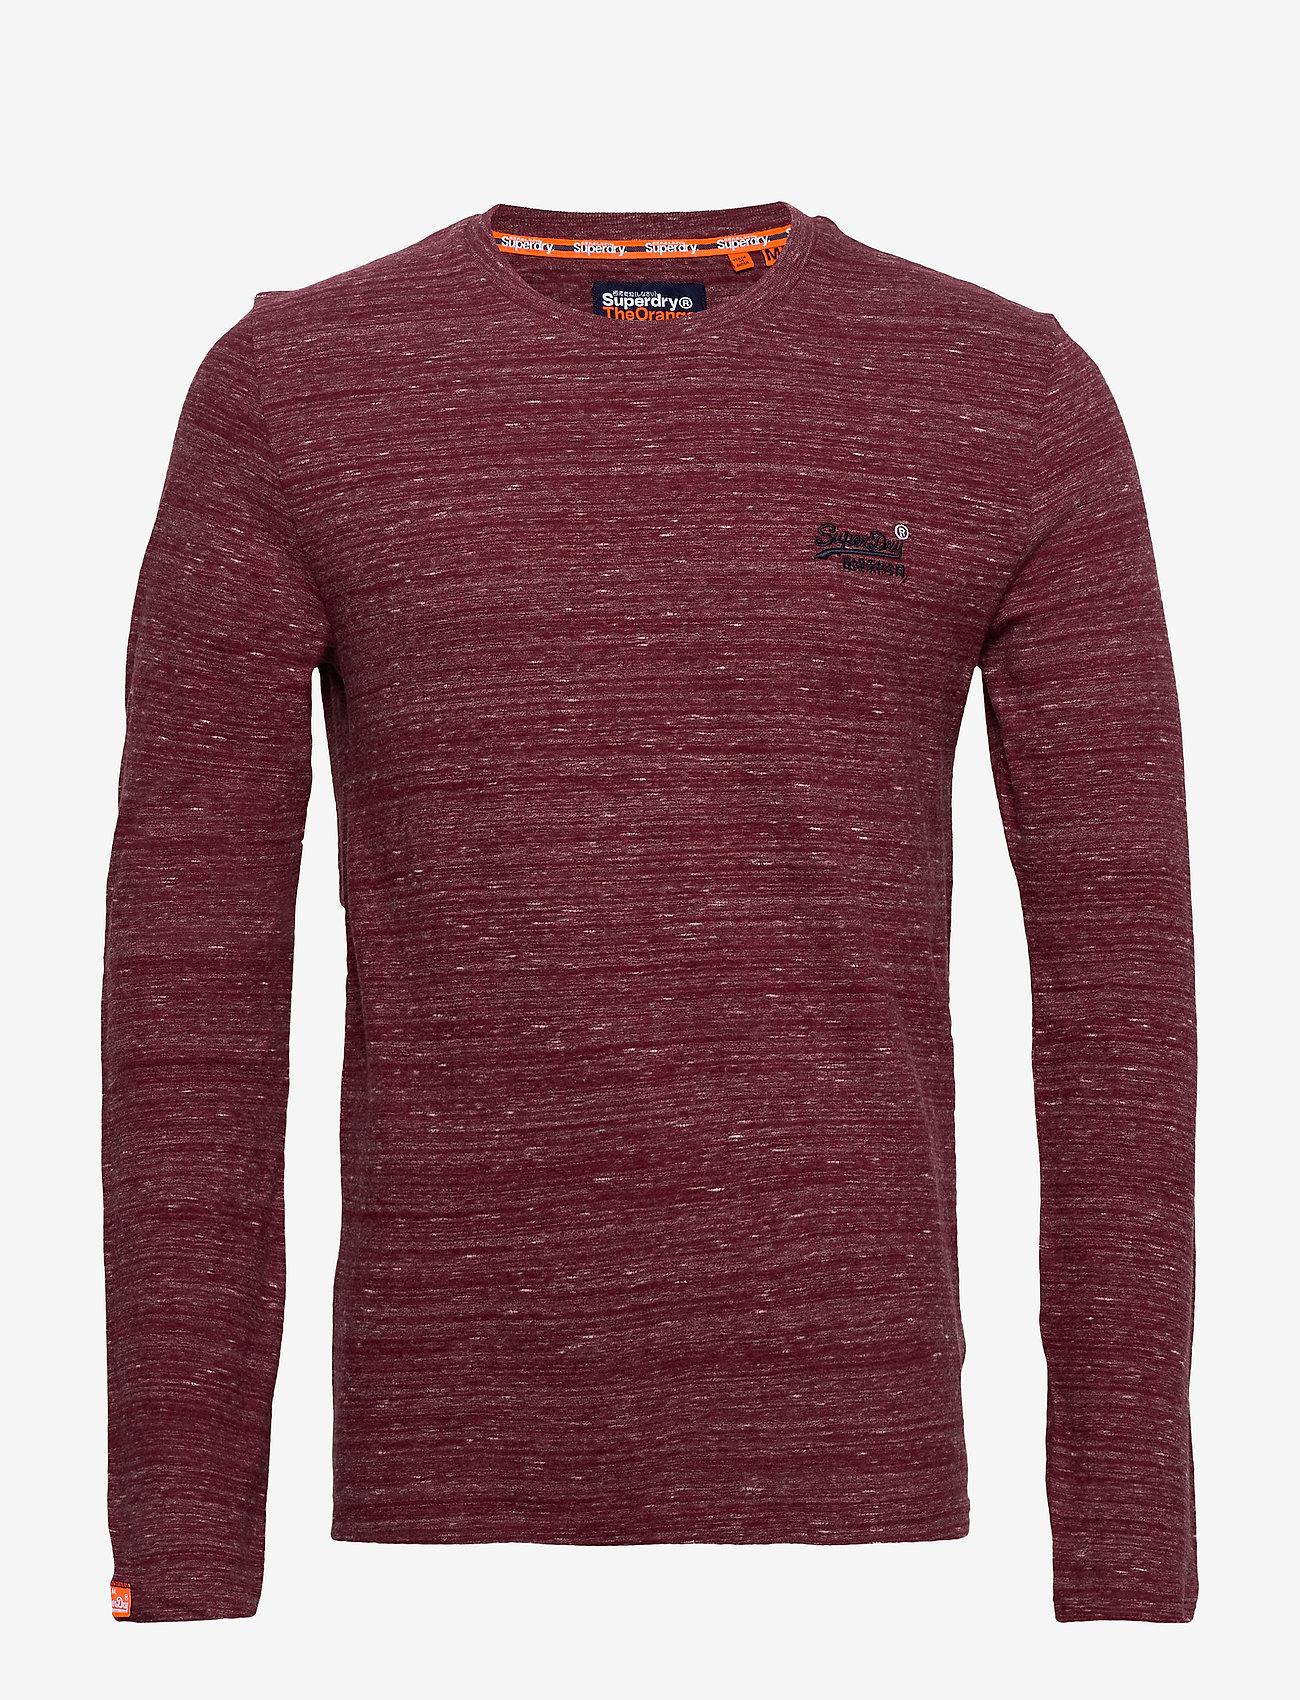 Superdry Ol Vintage Emb Ls Top - T-shirts BRICK RED SPACE DYE H0ueLyLw